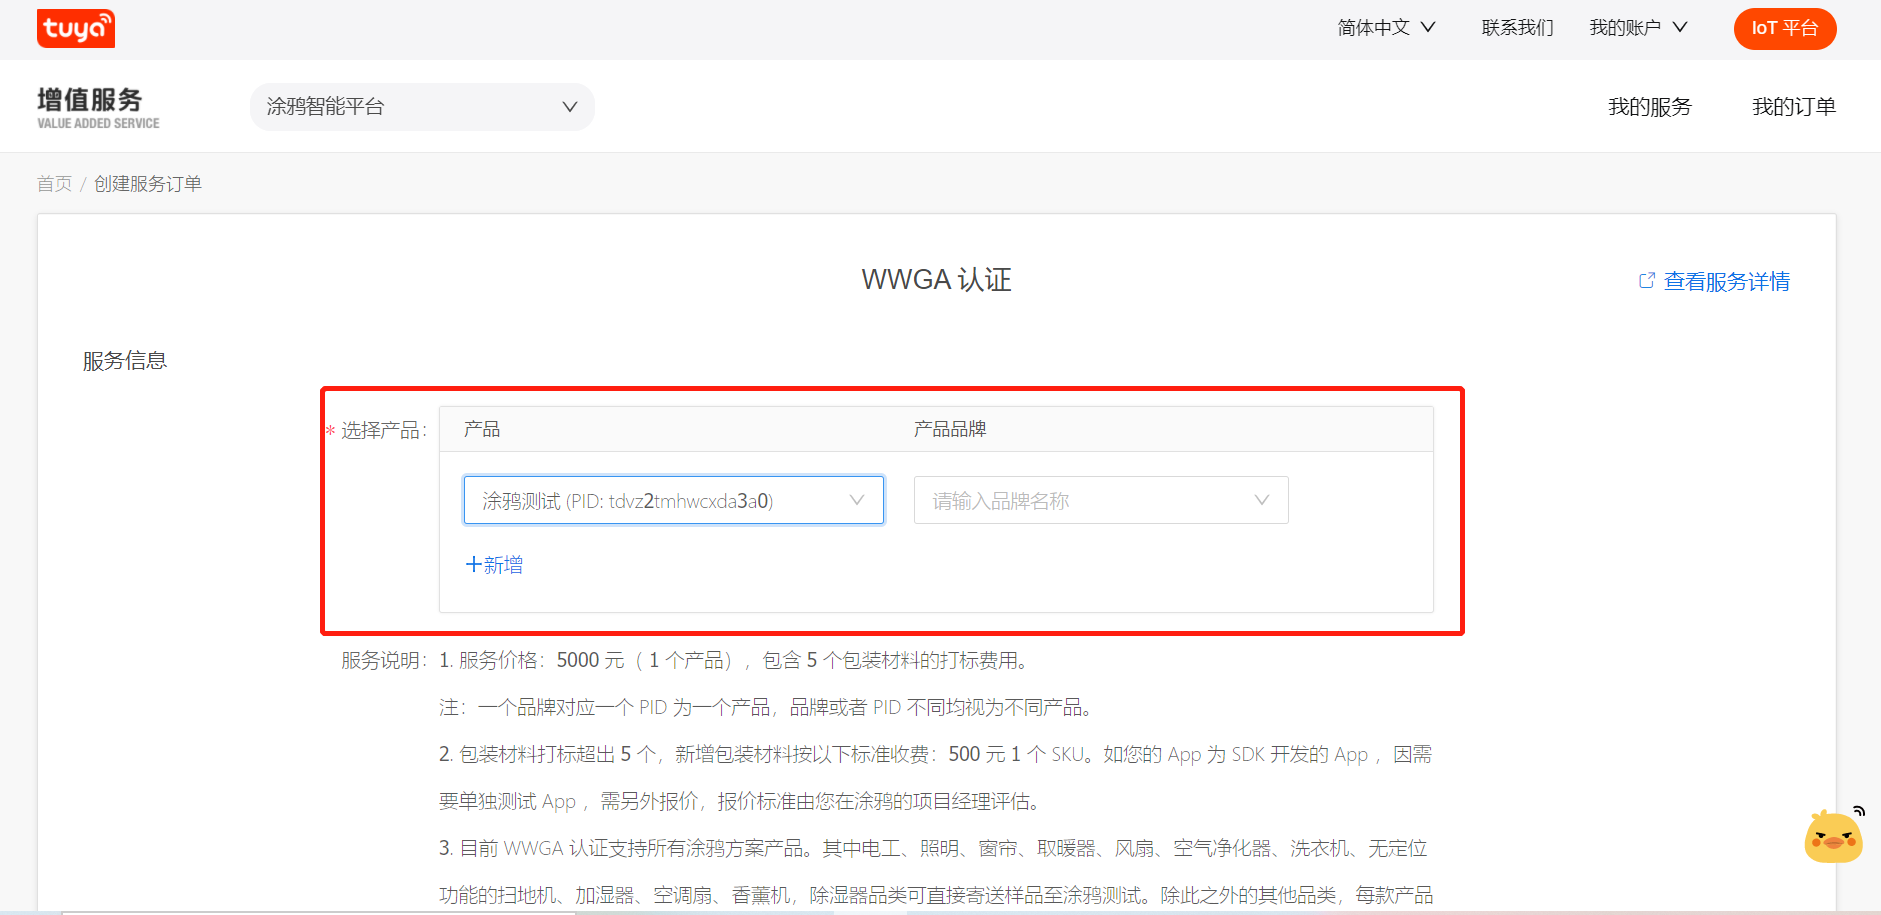 WWGA 认证